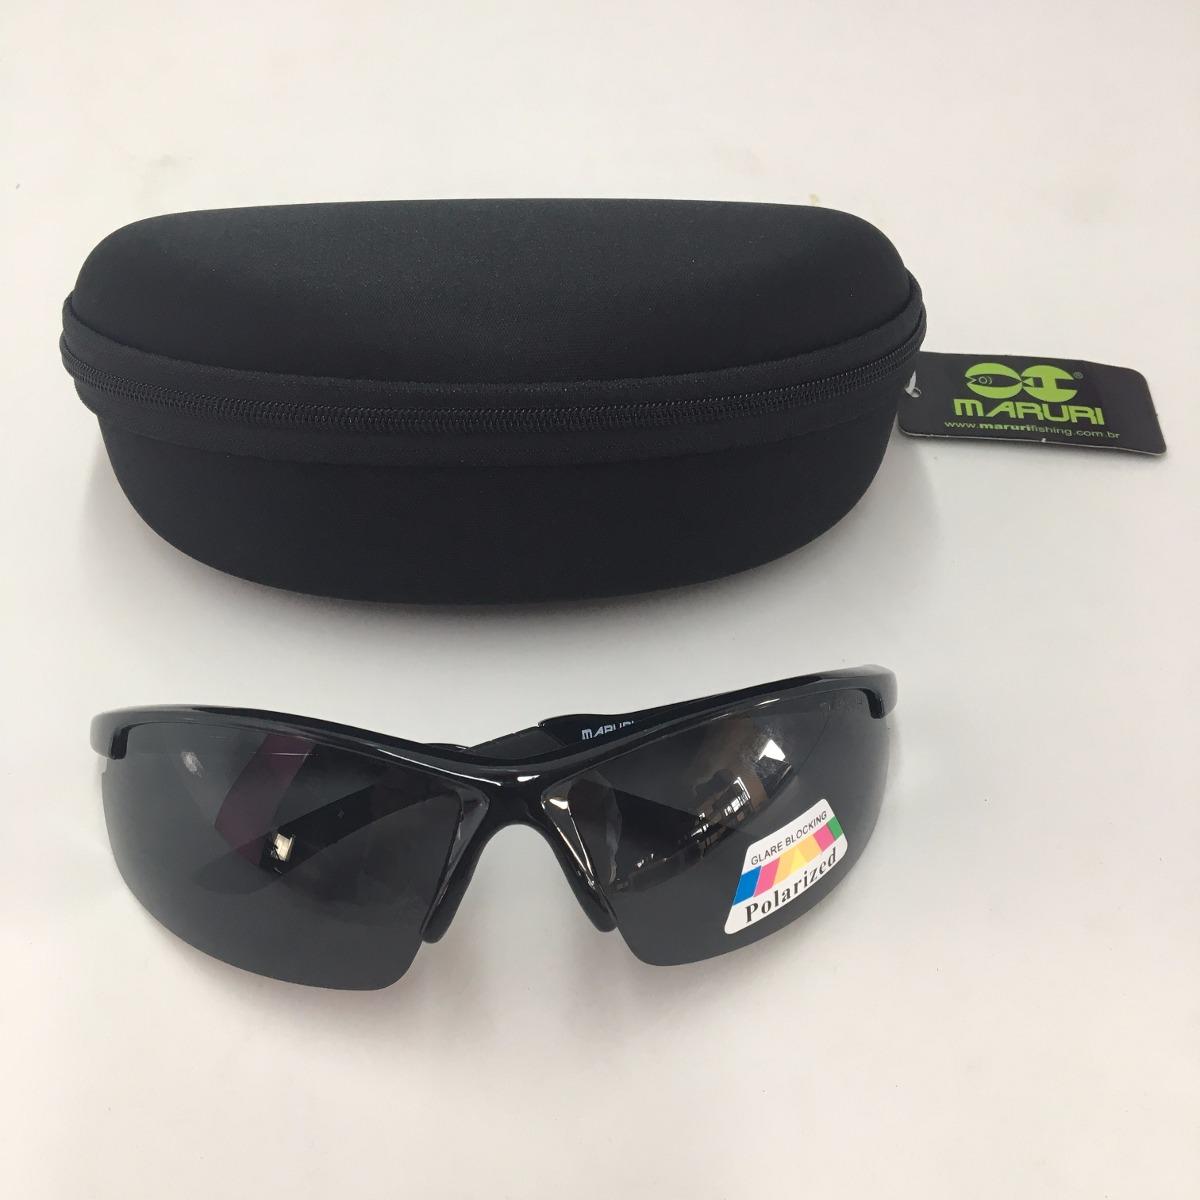 61aaa2dd77efa óculos polarizado anti-reflexos pra pesca maruri dz6575. Carregando zoom.